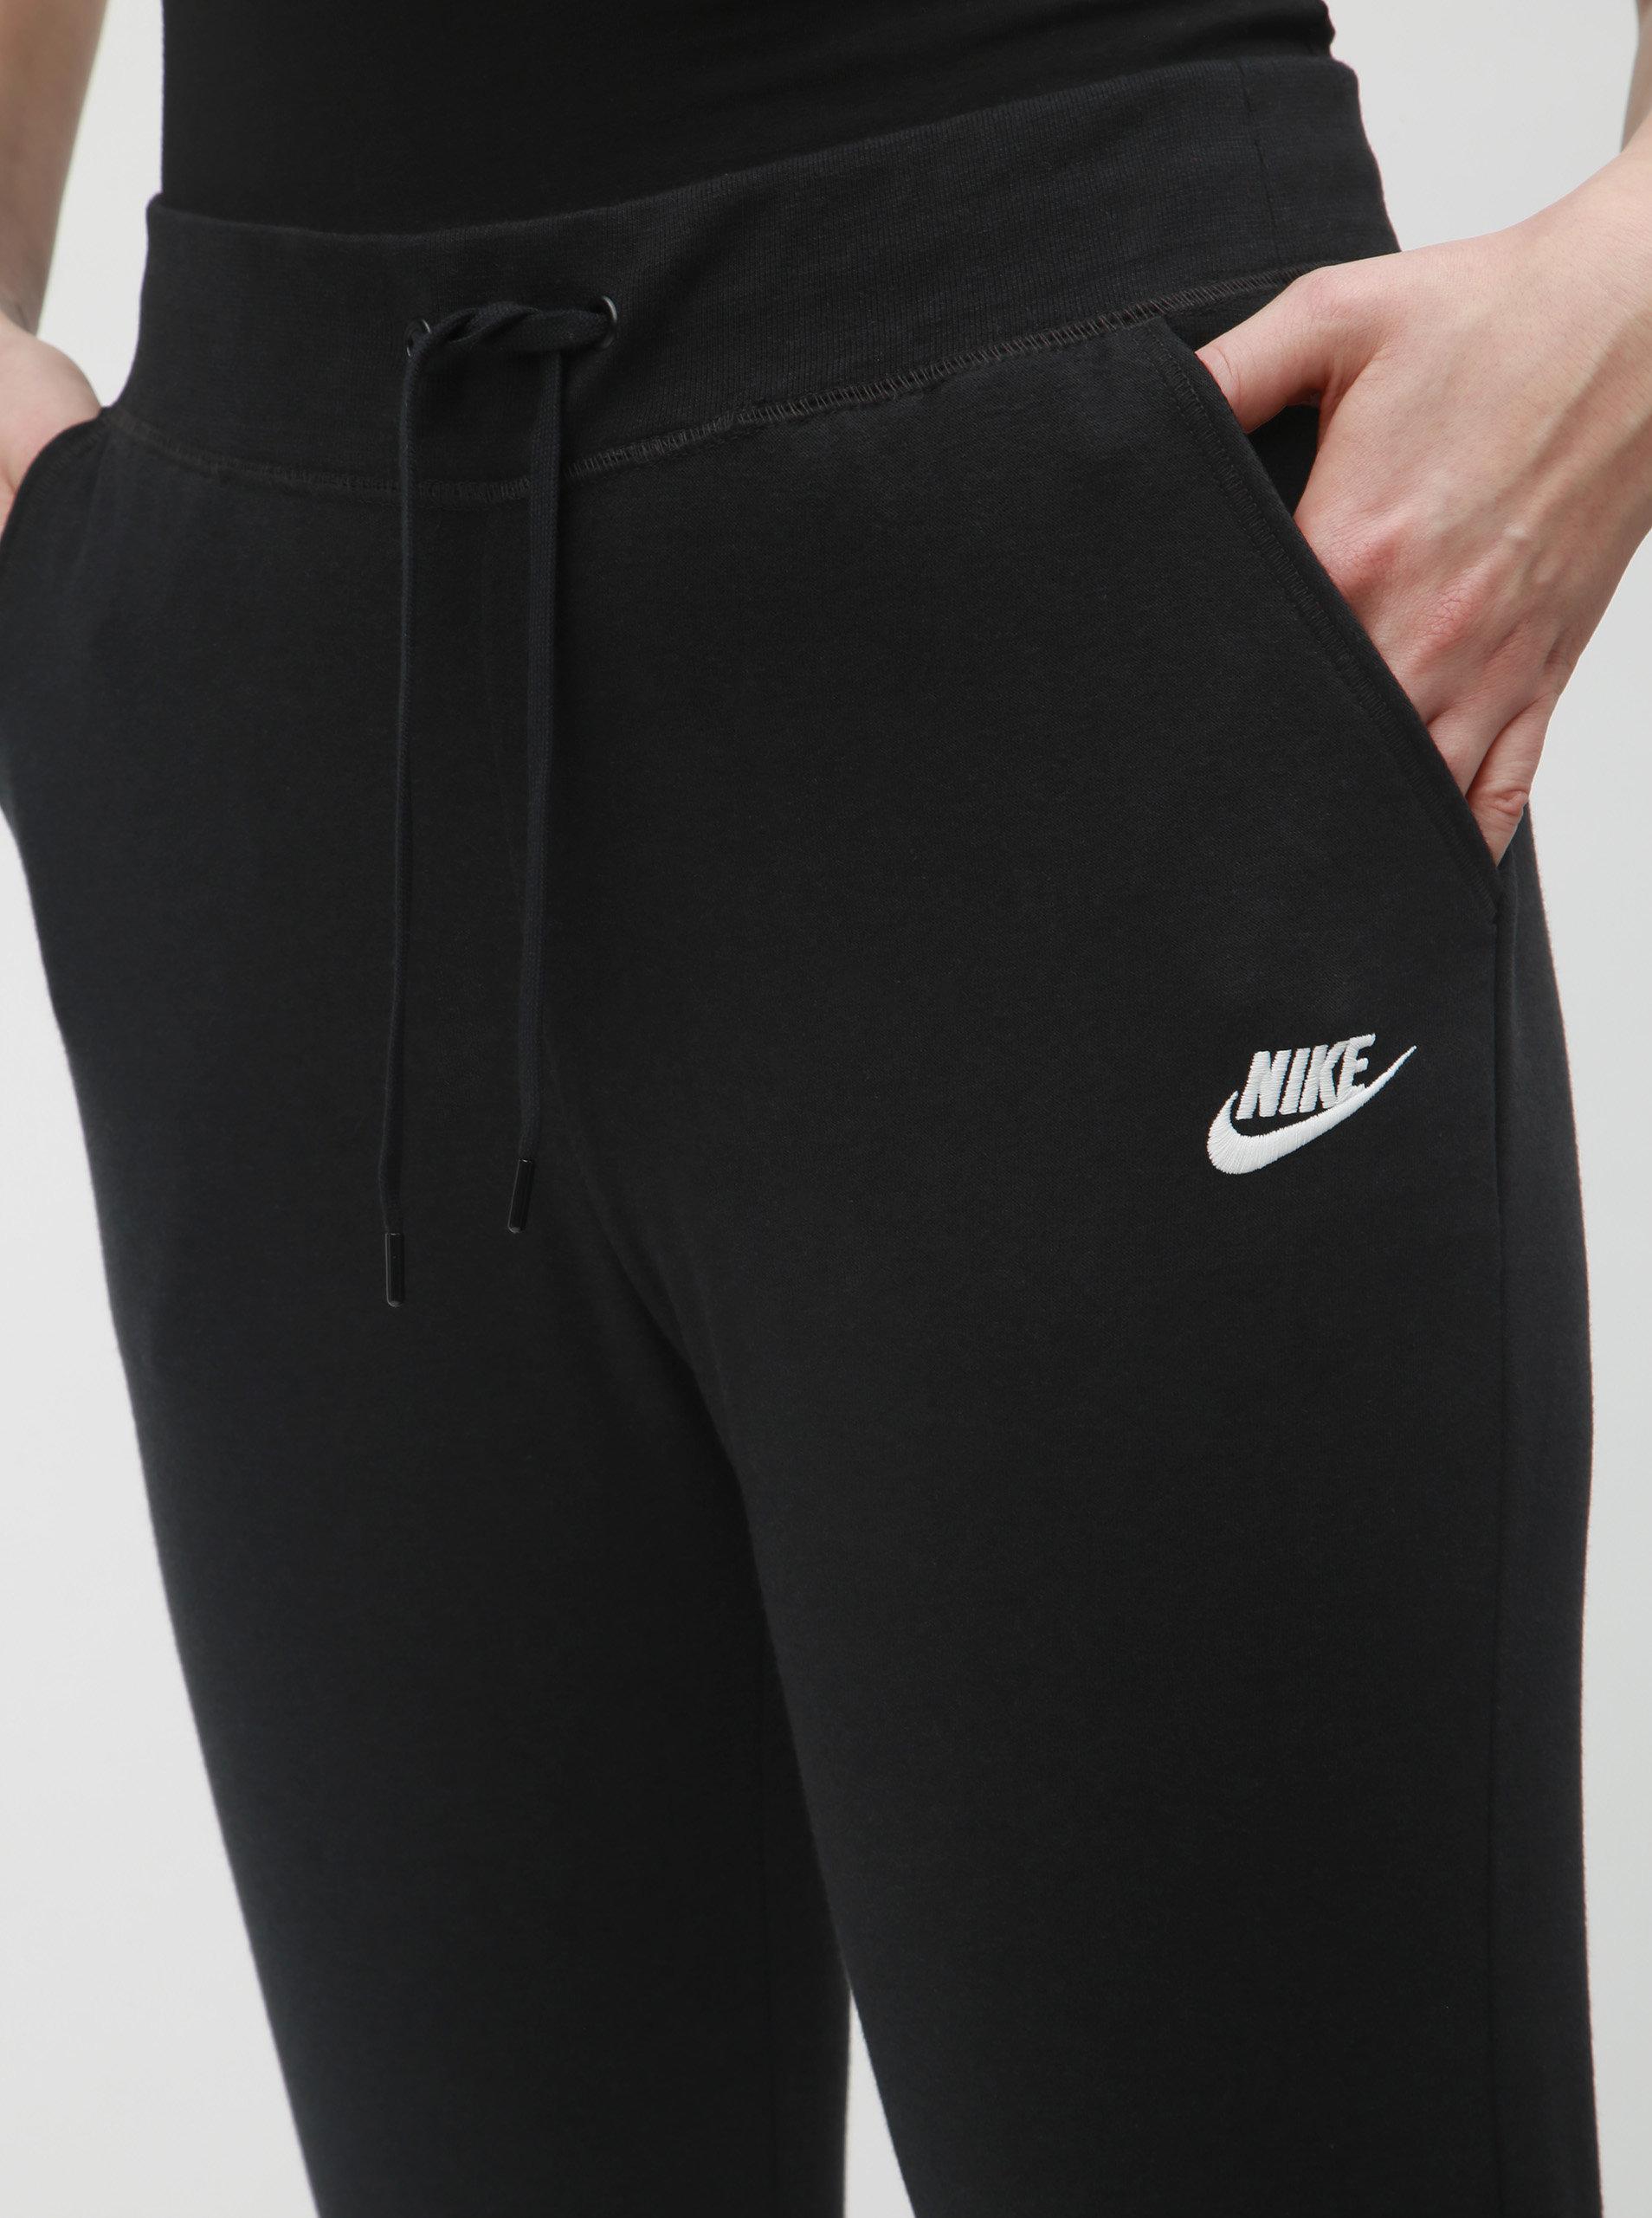 0f87e4dee Čierne dámske tepláky Nike | ZOOT.sk